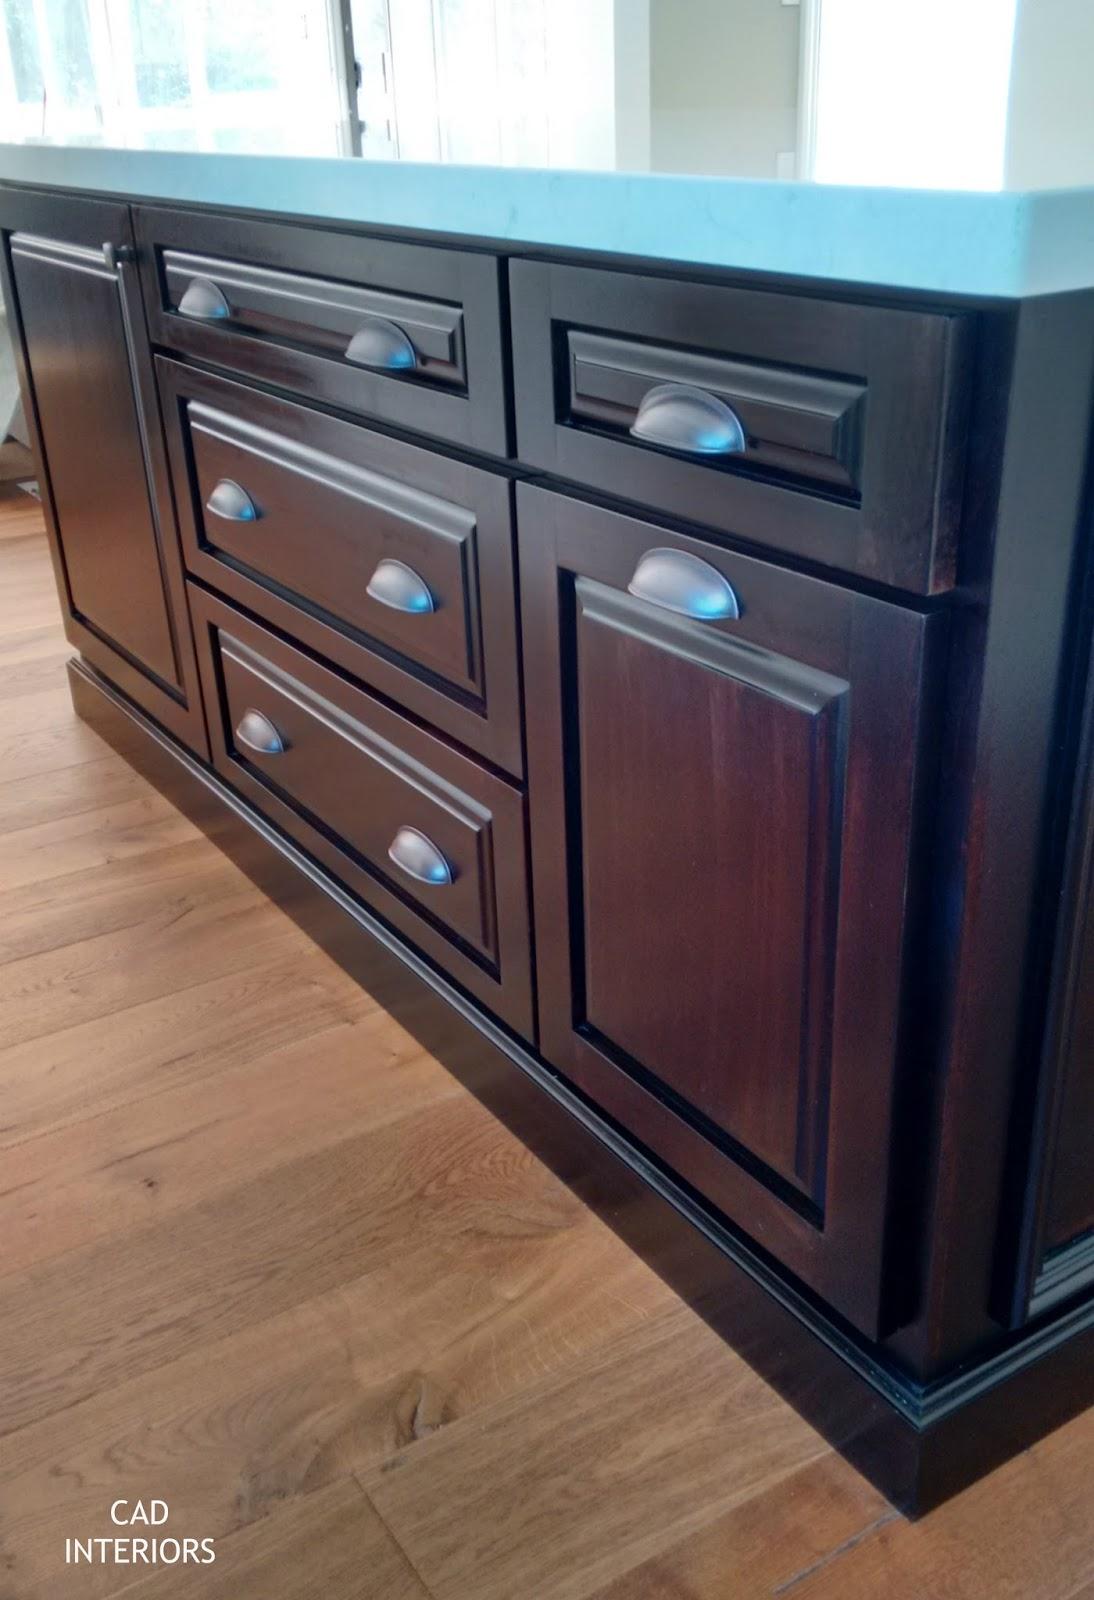 quartz countertops CAD INTERIORS kitchen renovation home improvement modern farmhouse kitchen design aged bronze hardware